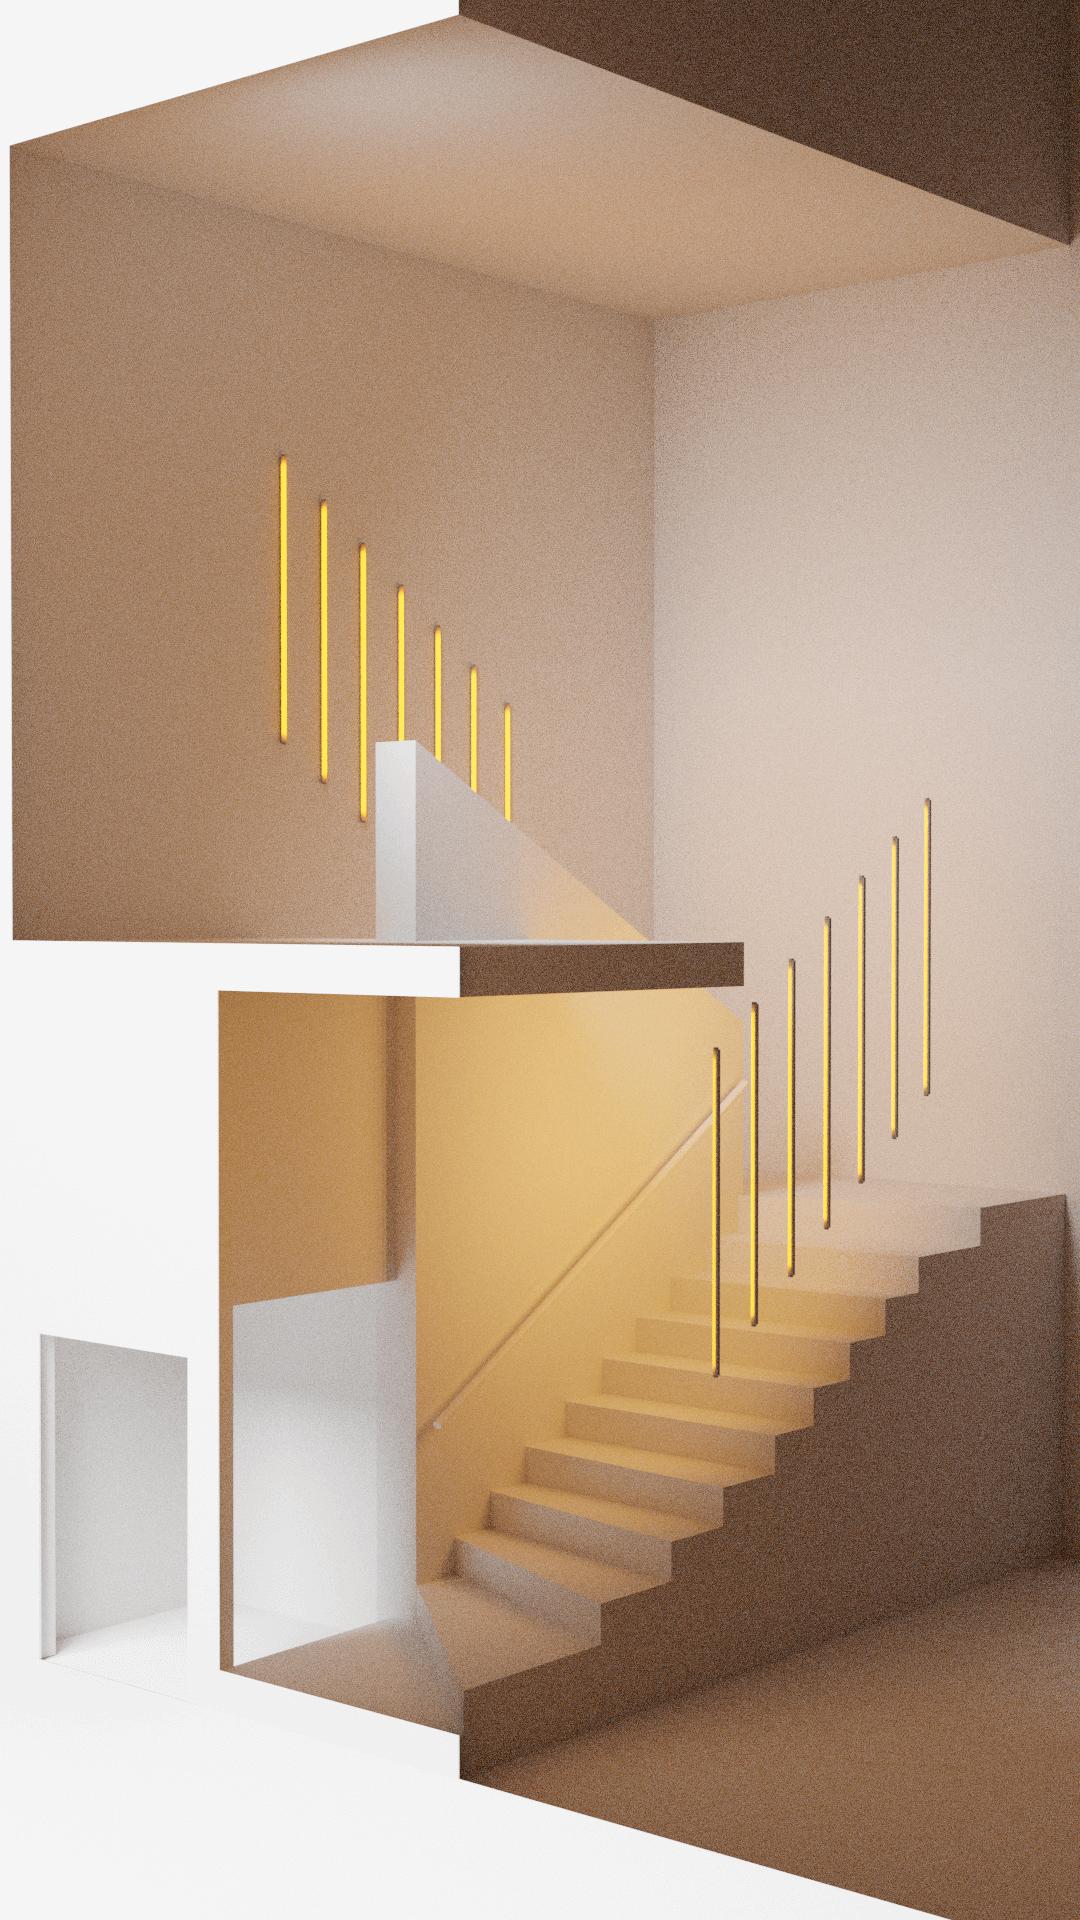 Neuland_Stairway_day_1